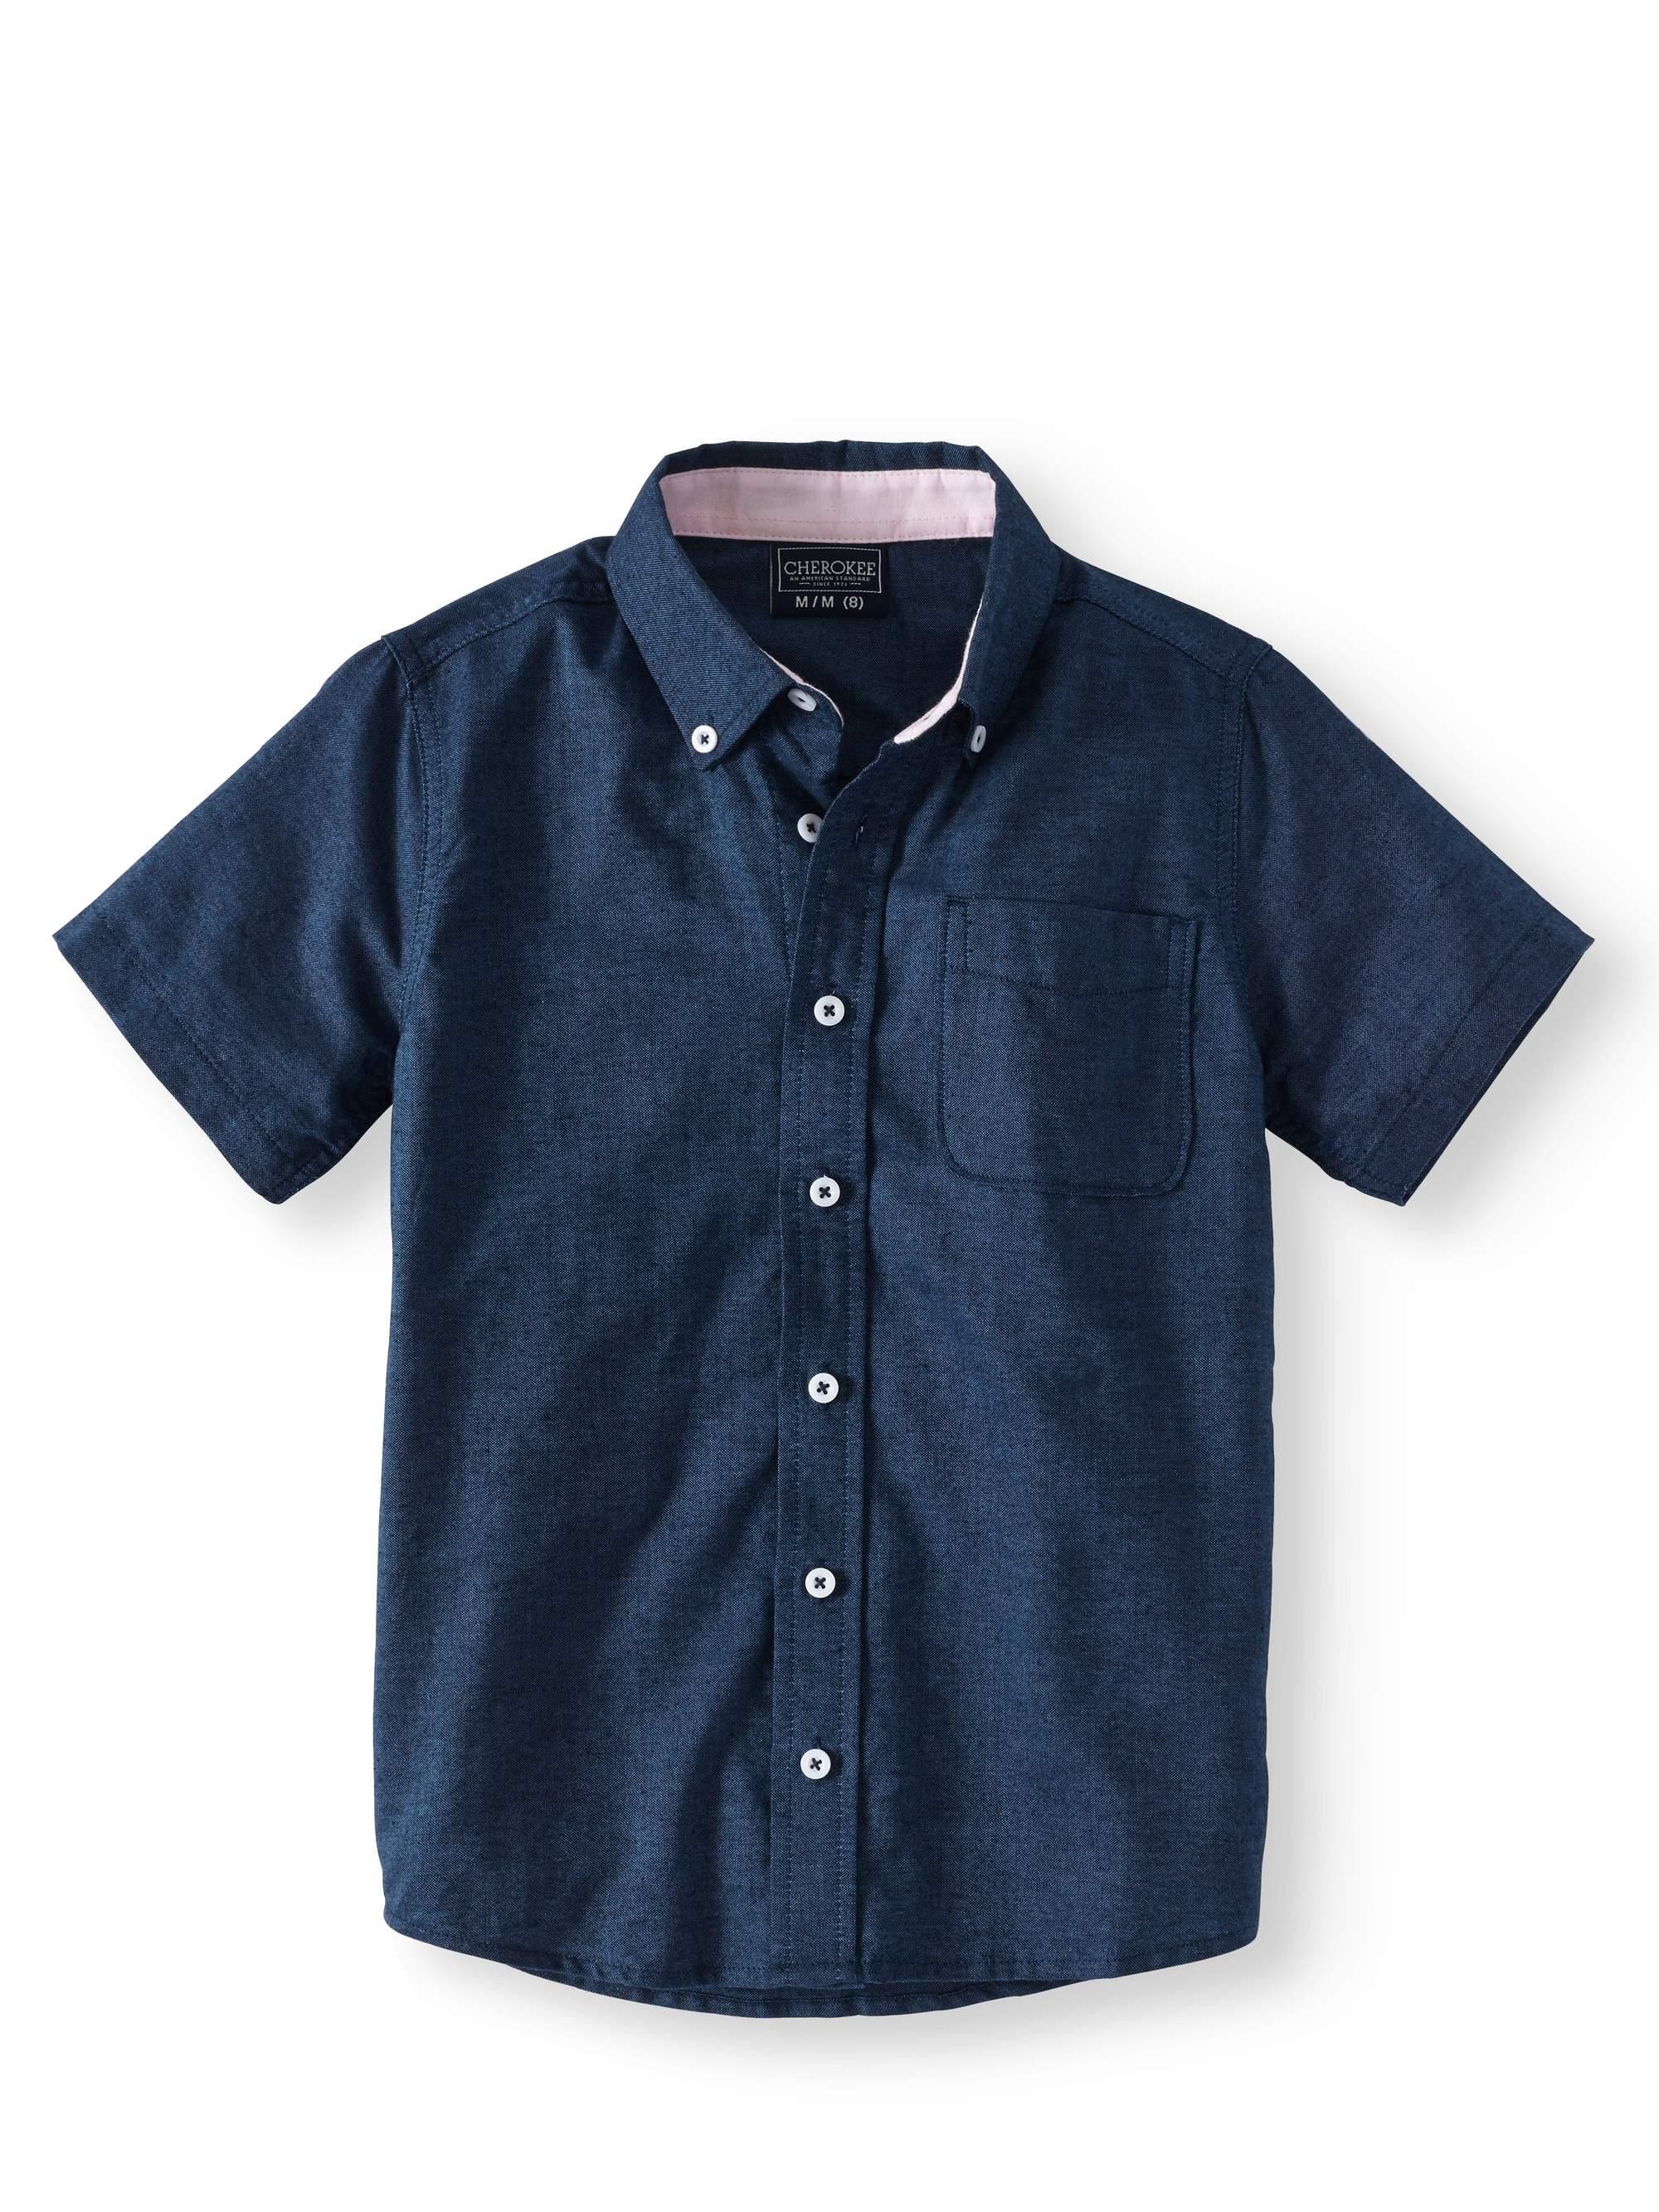 Boys' Short Sleeve Button Front Oxford Shirt